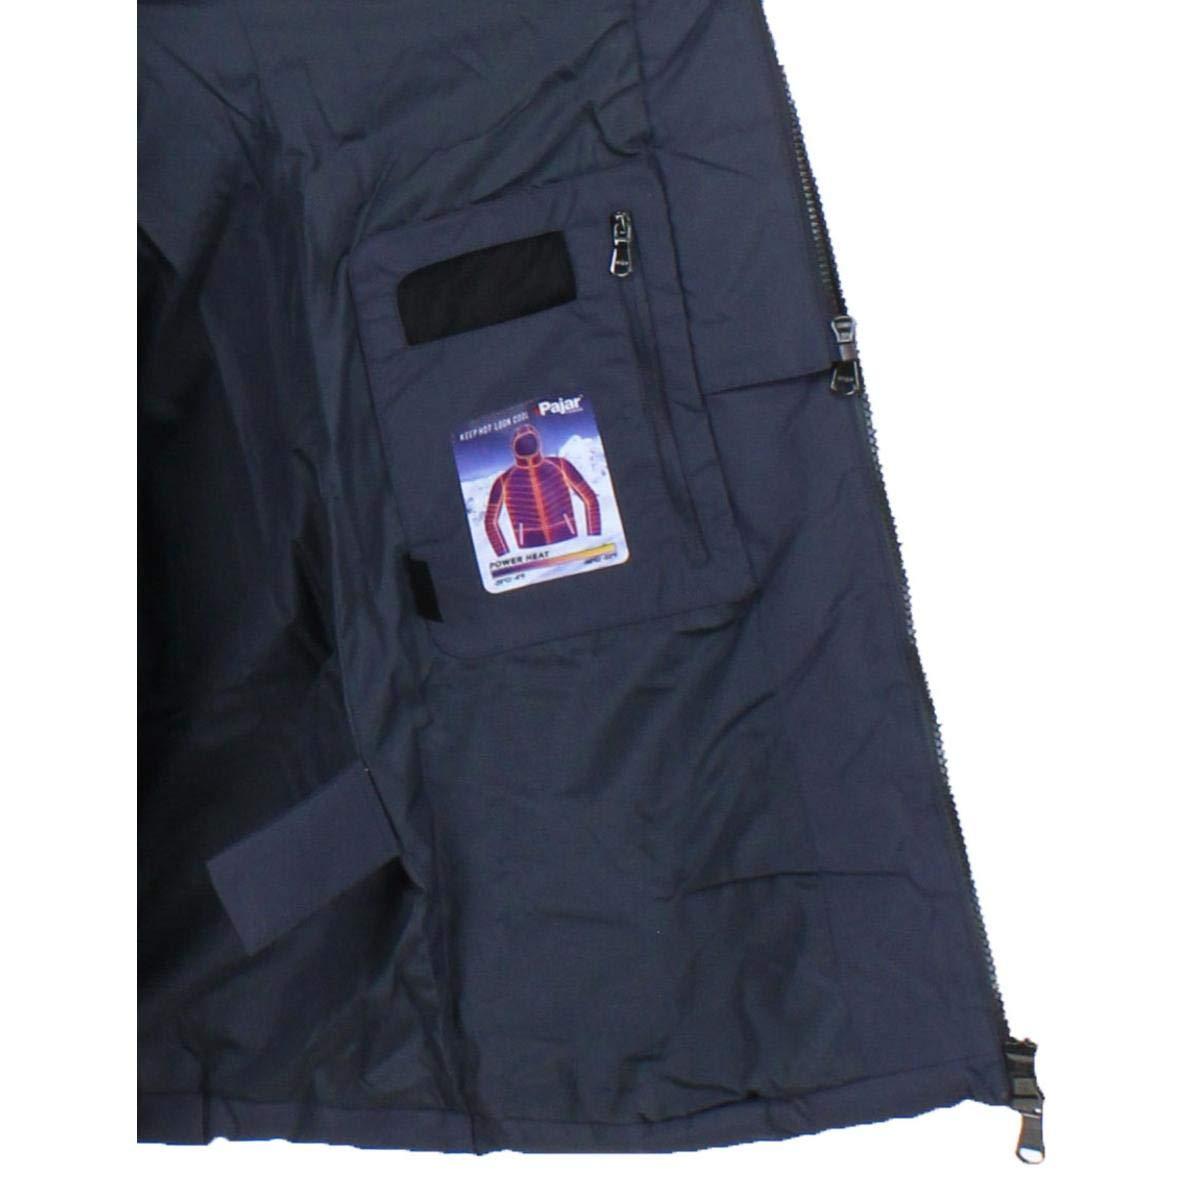 72160f305b8 Pajar Women's Annie Duck Down Long Winter Cold Weather Parka Coat Gray Size  S at Amazon Women's Coats Shop